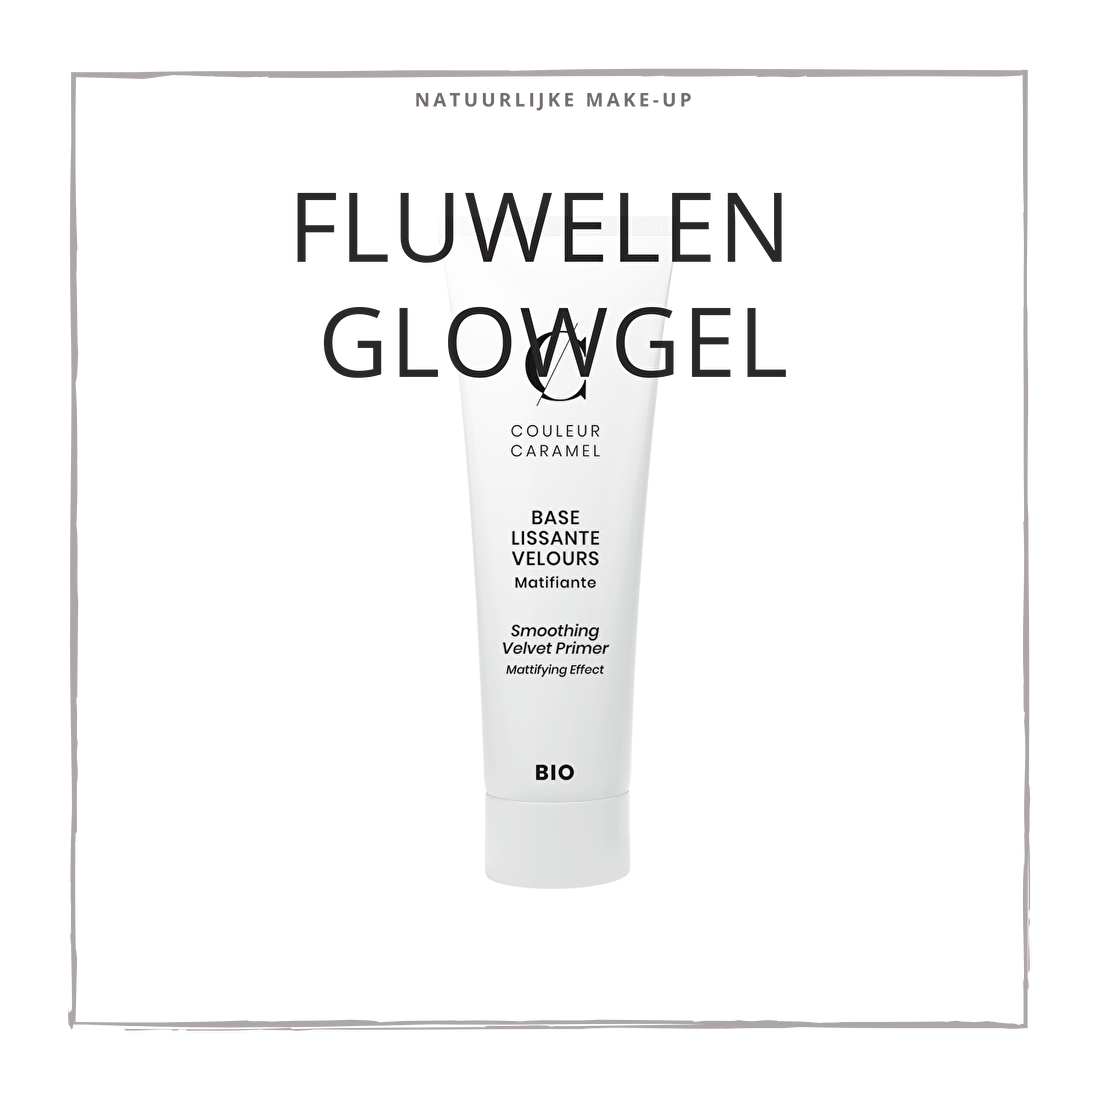 natuurlijke make-up Glow Gel CouleurCaramelmakeup.nl